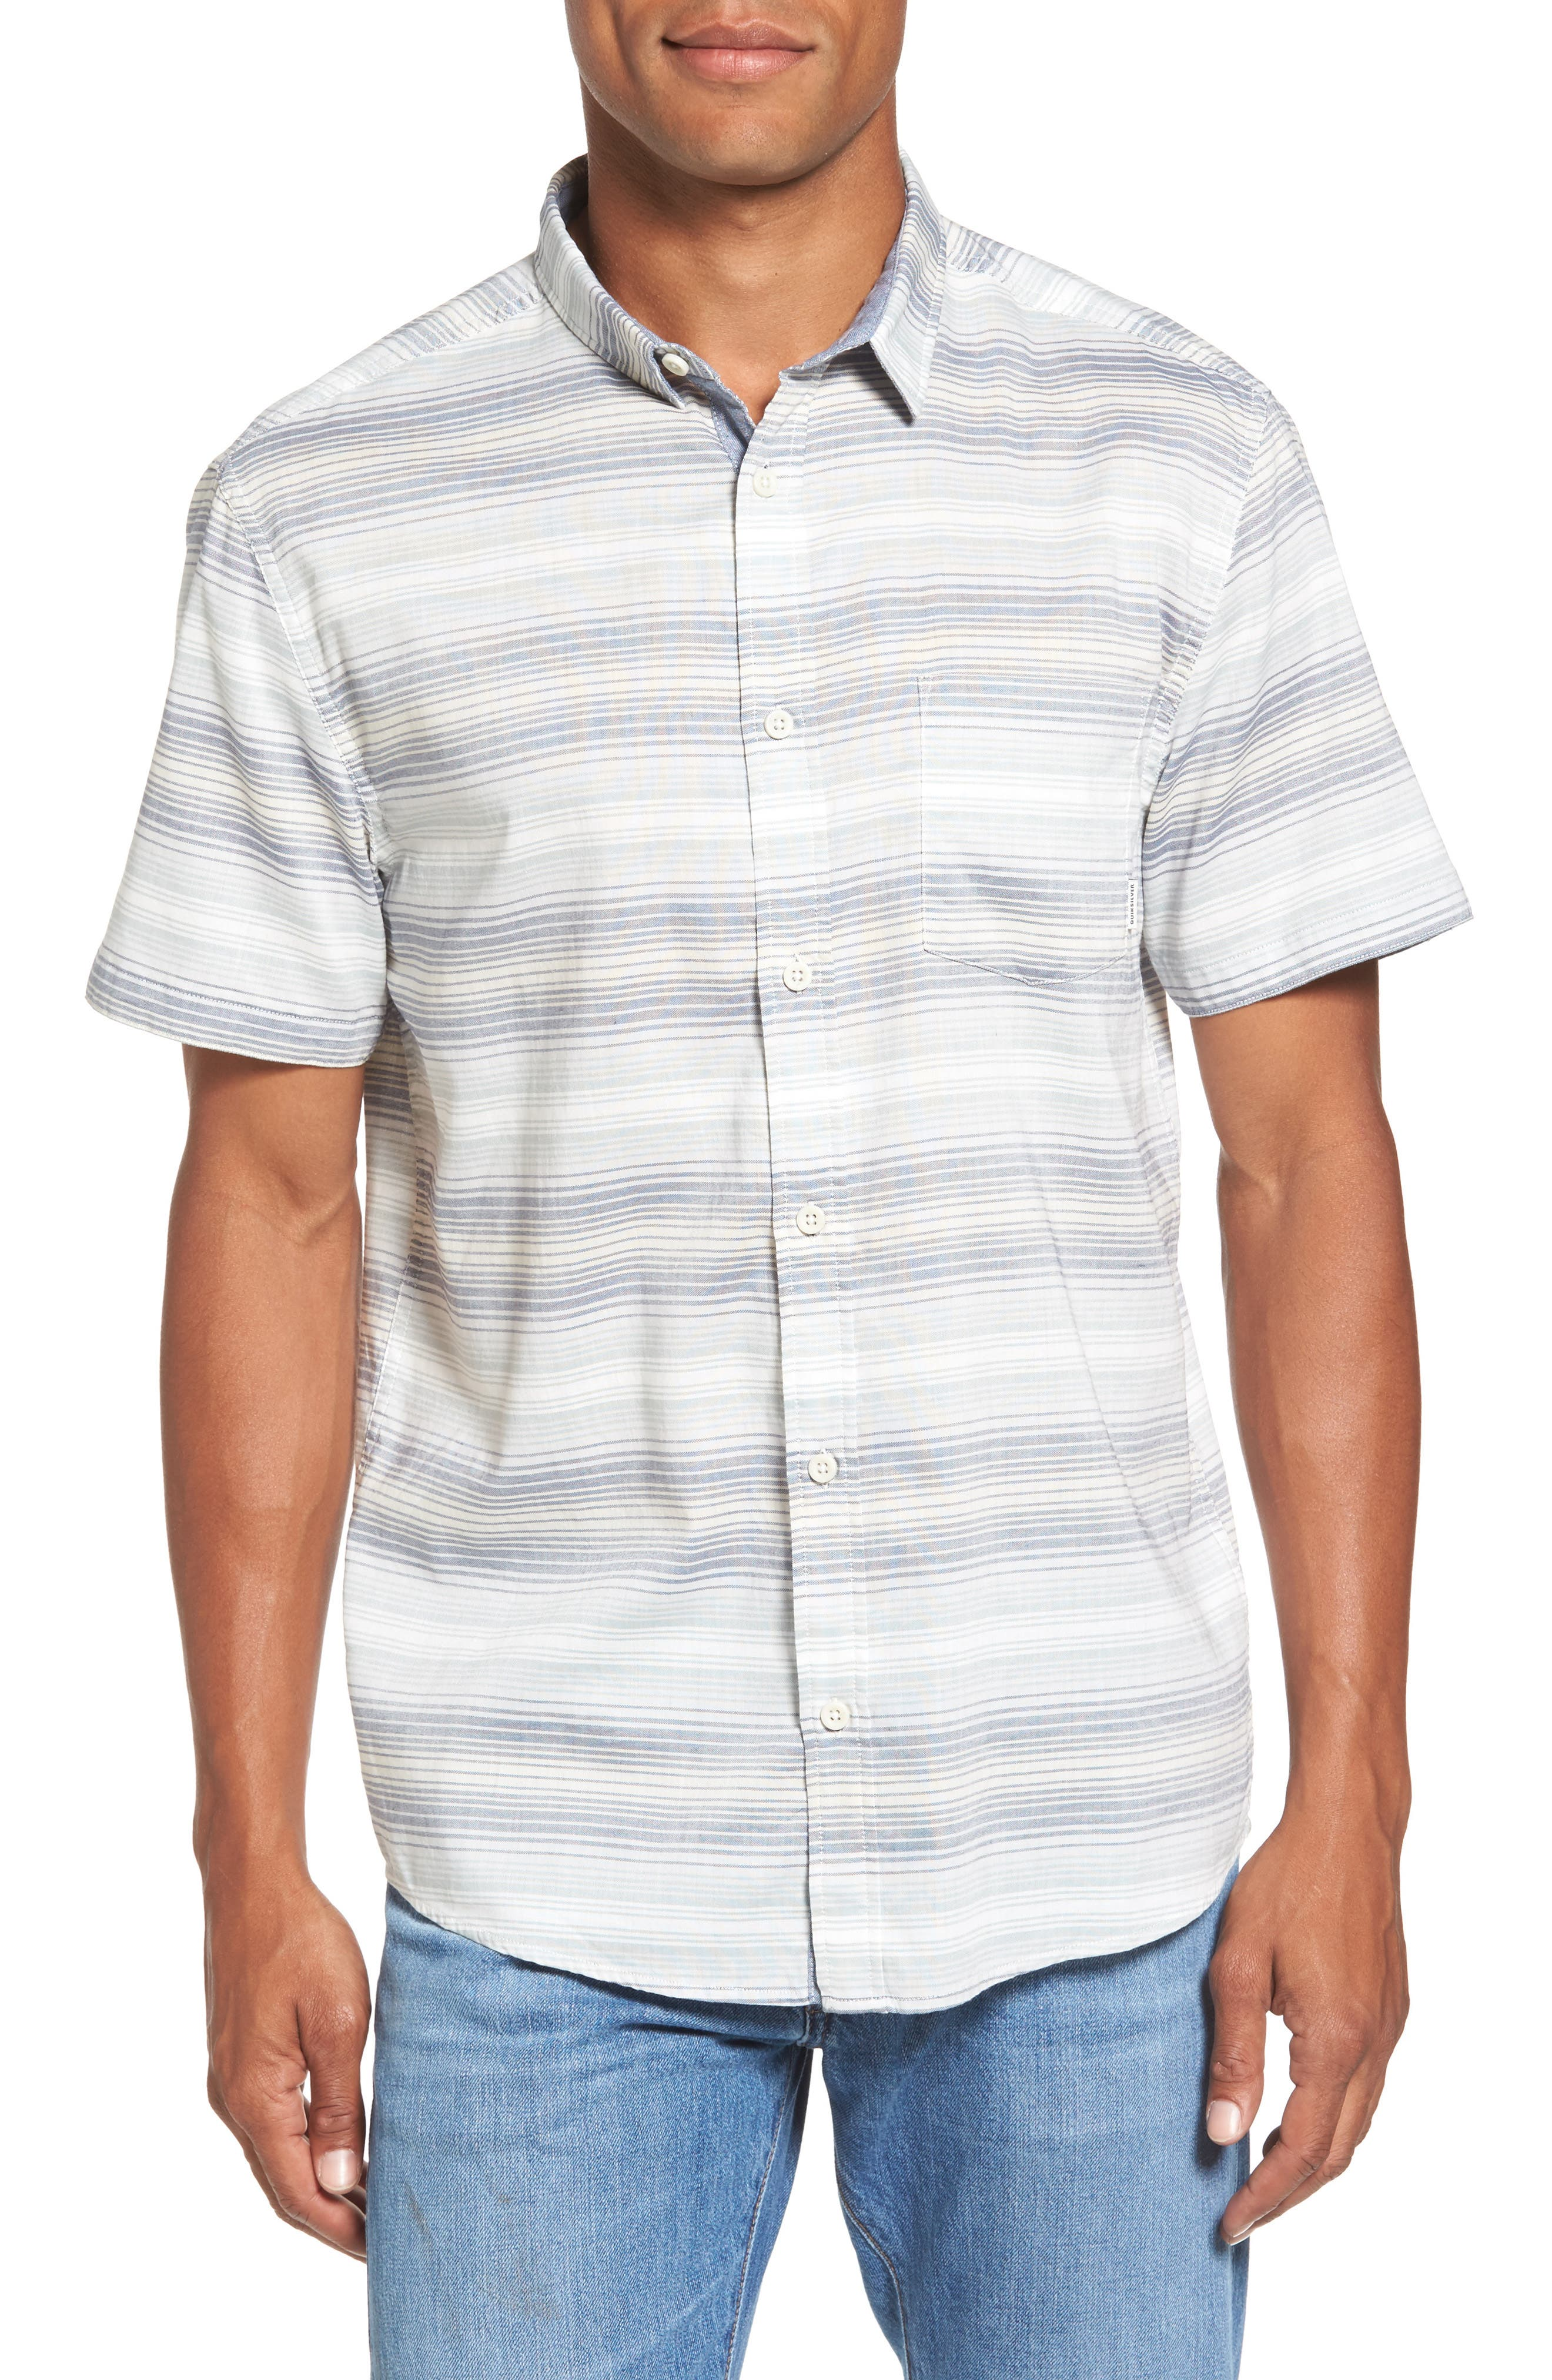 Aventail Stripe Shirt,                         Main,                         color, Blue